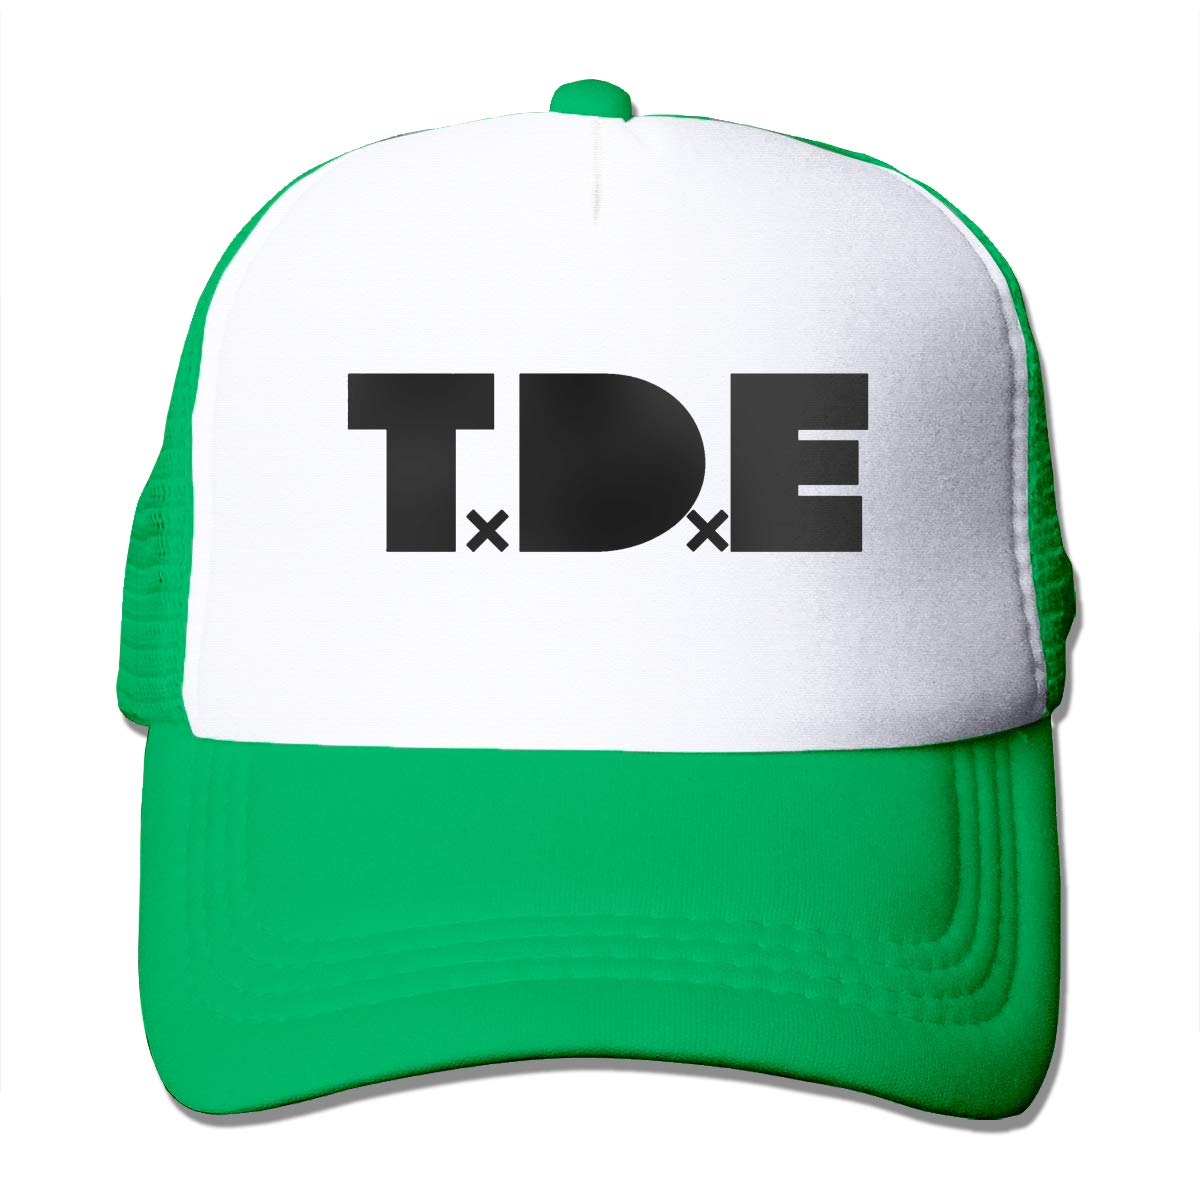 SingleLove TDE Logo Dreamville Records Mesh Back Adjustable.